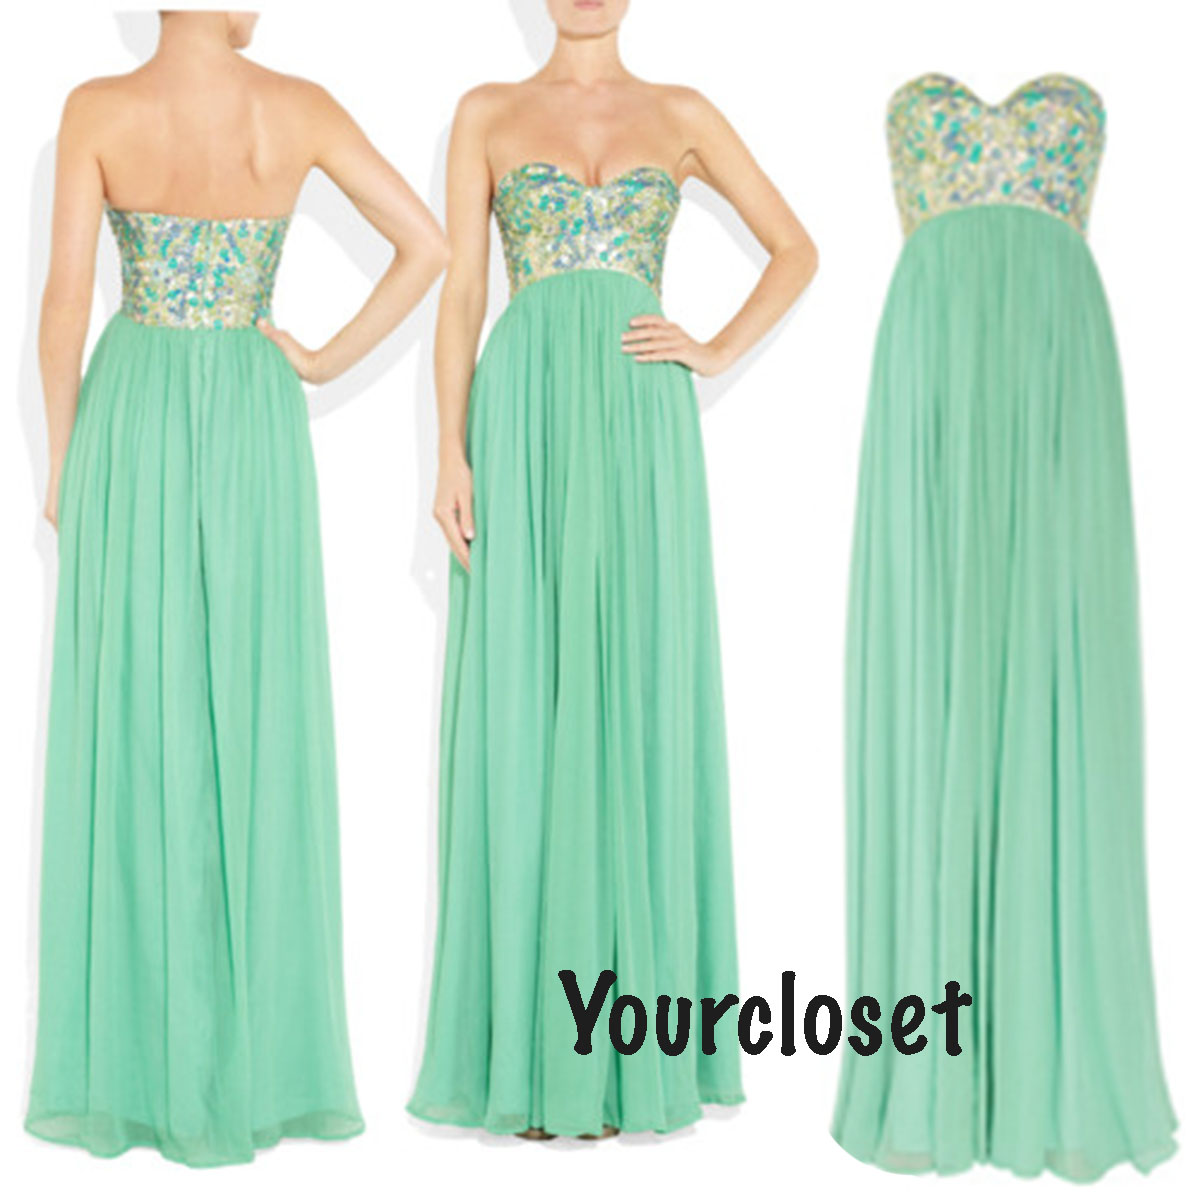 Fotos Dress Long Prom Dress Prom Dress Cute Butterfly